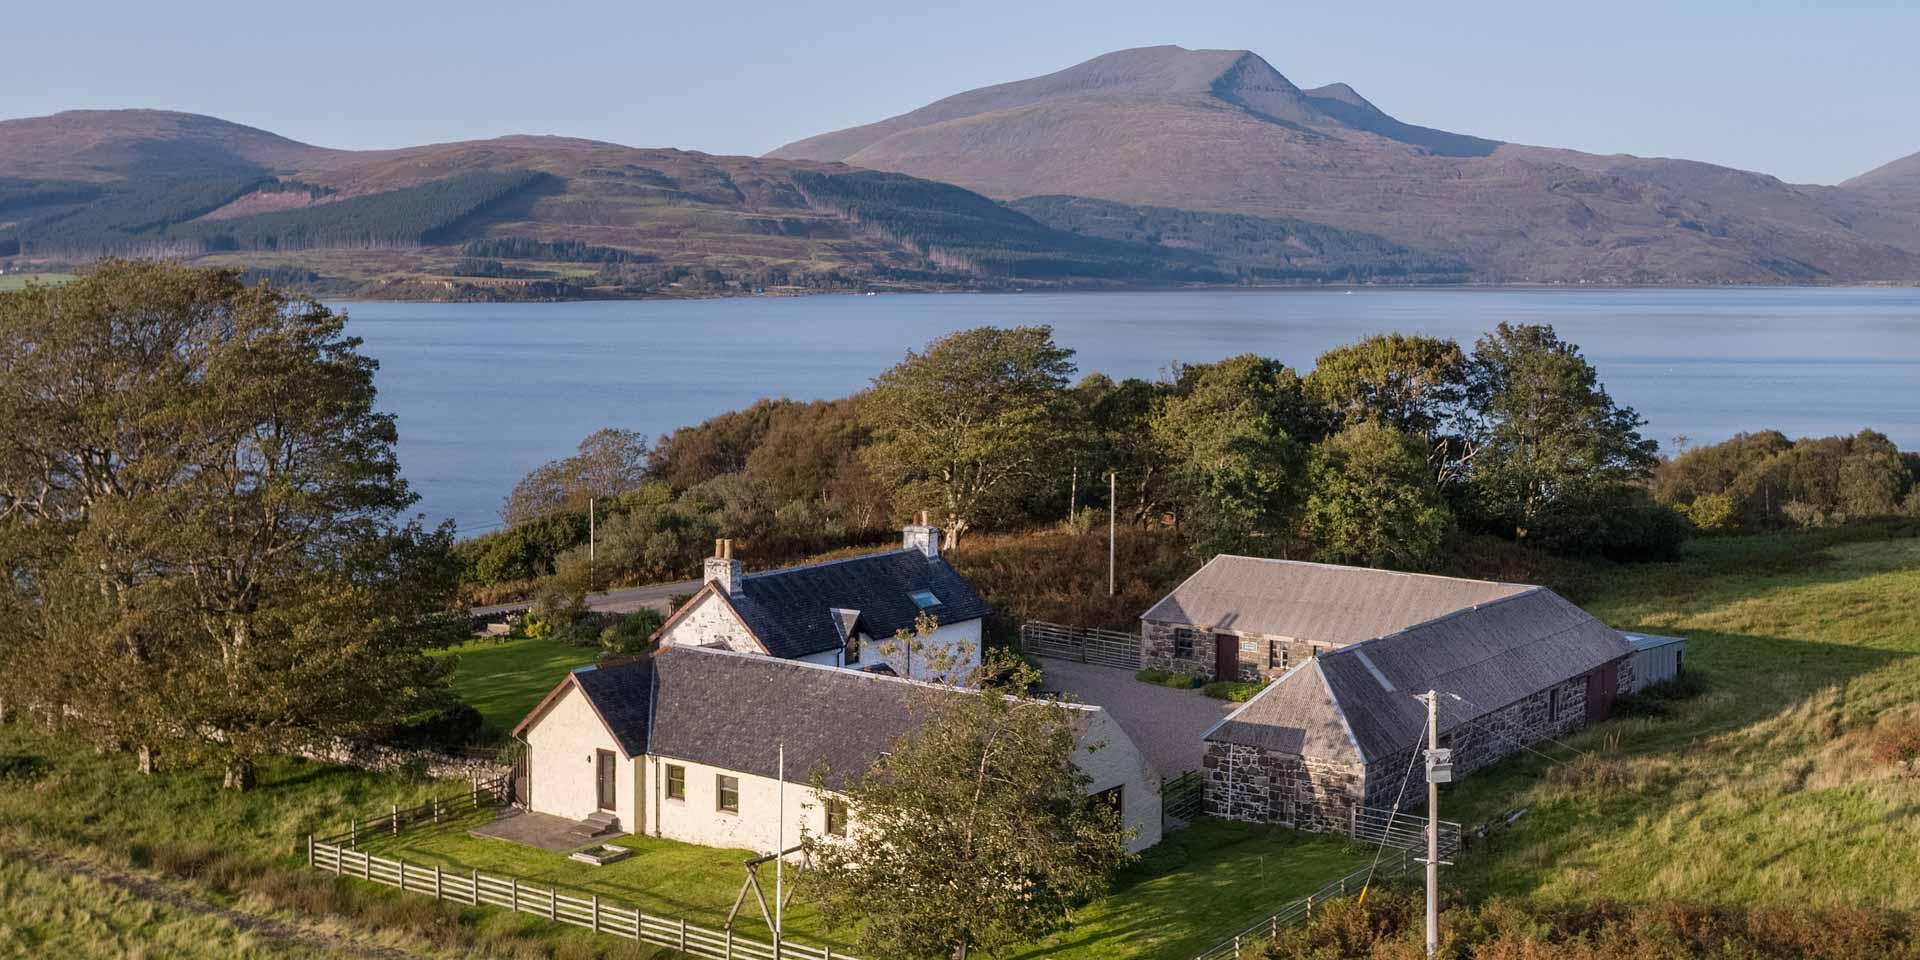 Killunaig self catering farmhouse at Pennyghael Estate on the Isle of Mull